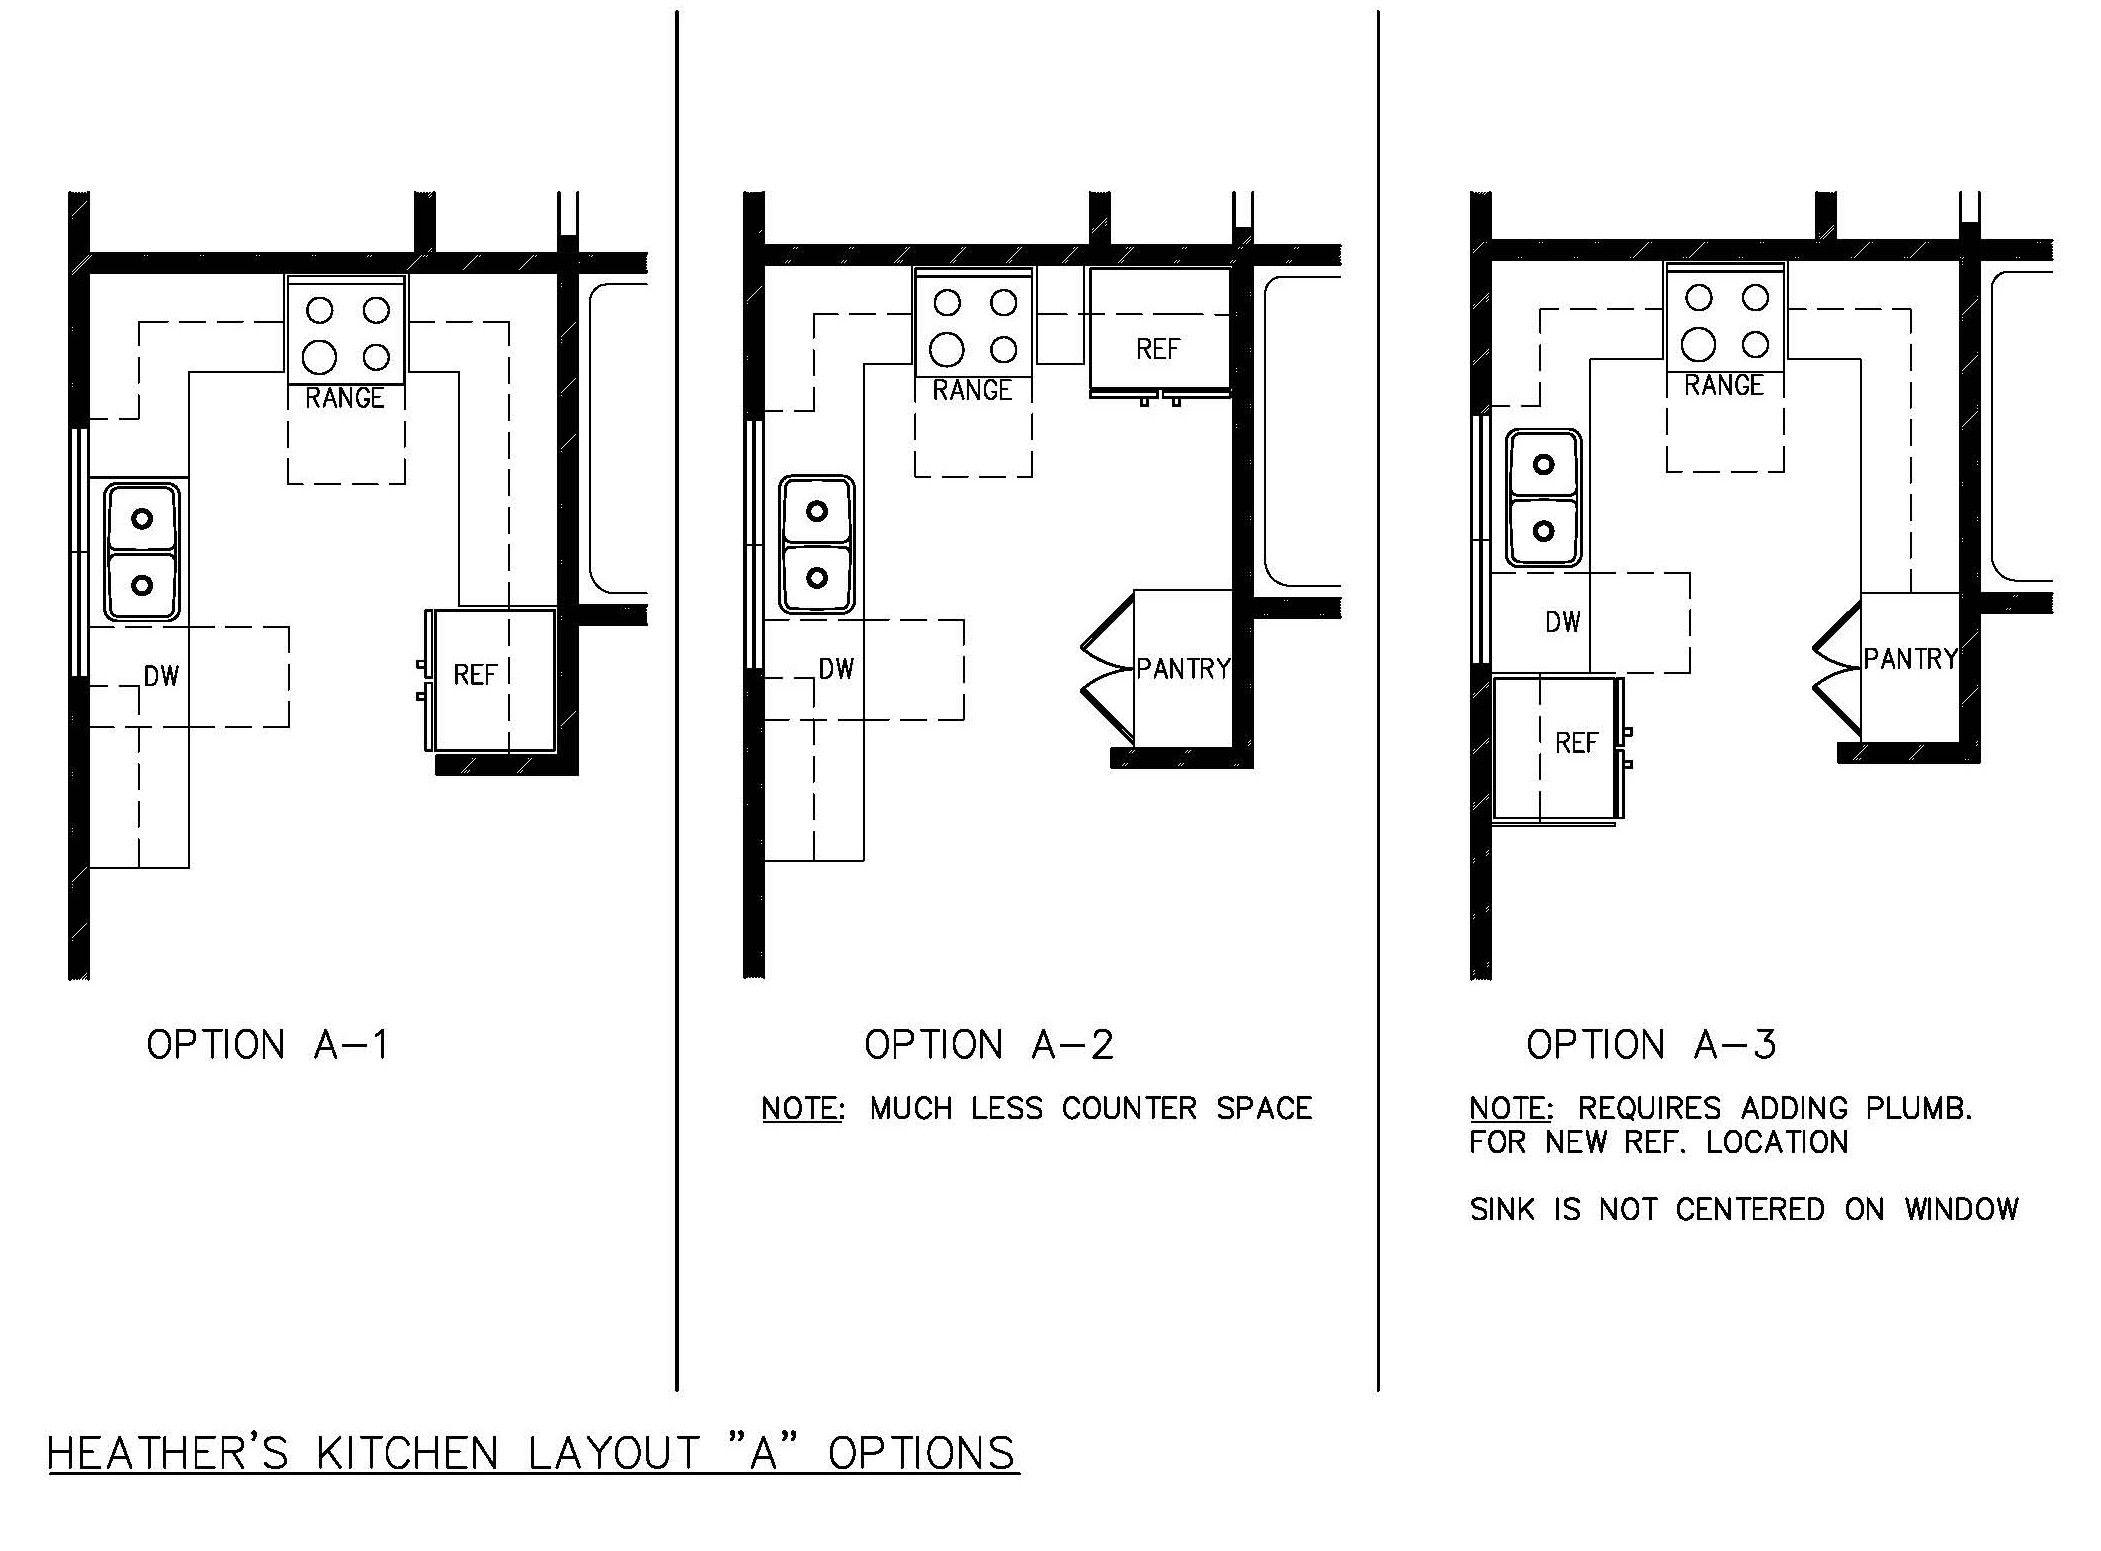 Kitchen floor plans atlantasaints.com/wp-content/uploads/2018/07/effic ... IDUUPTZ